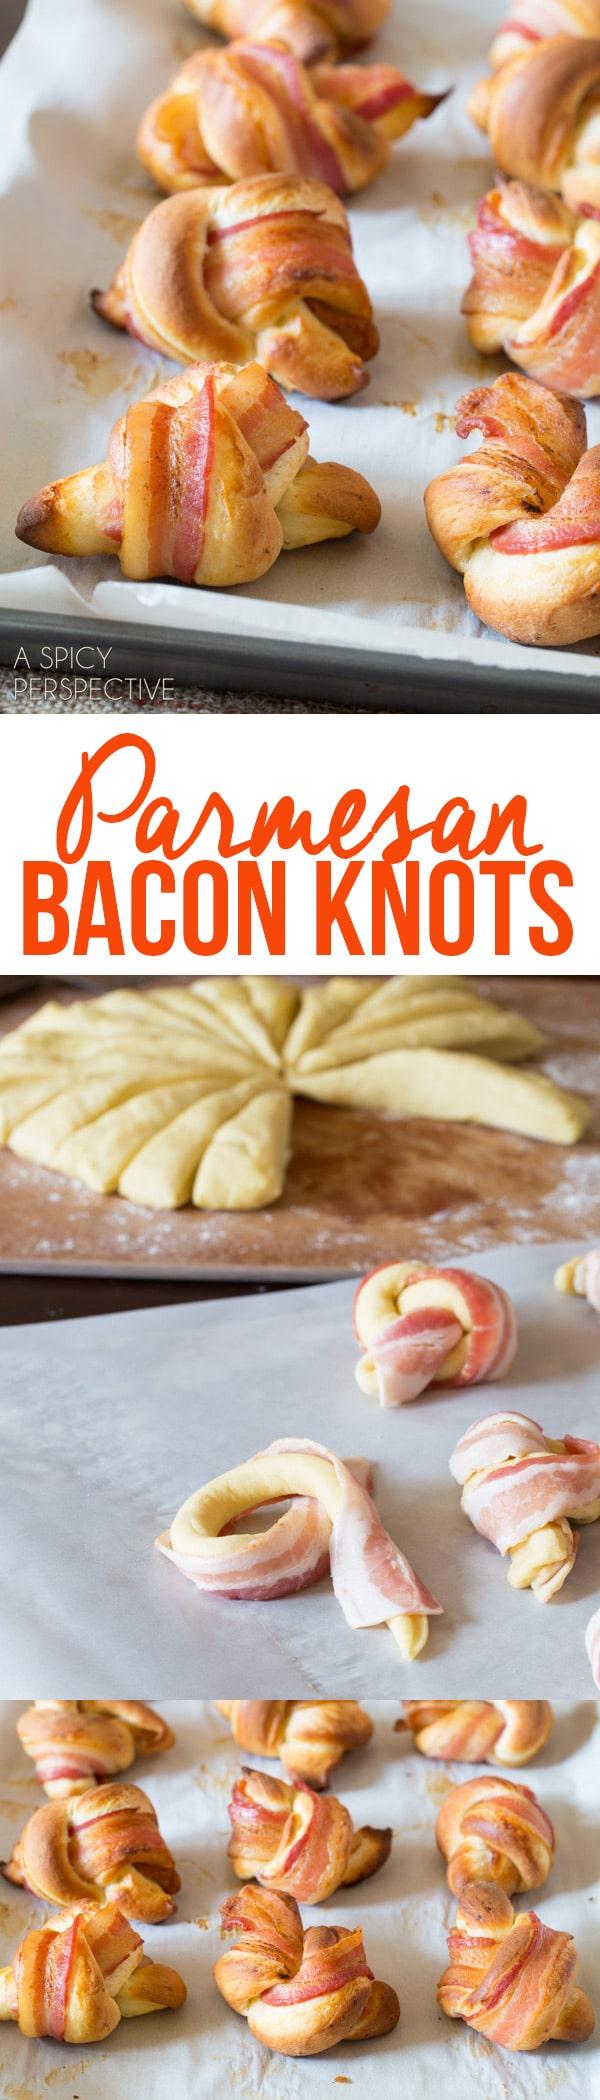 Parmesan Bacon Knots Recipe